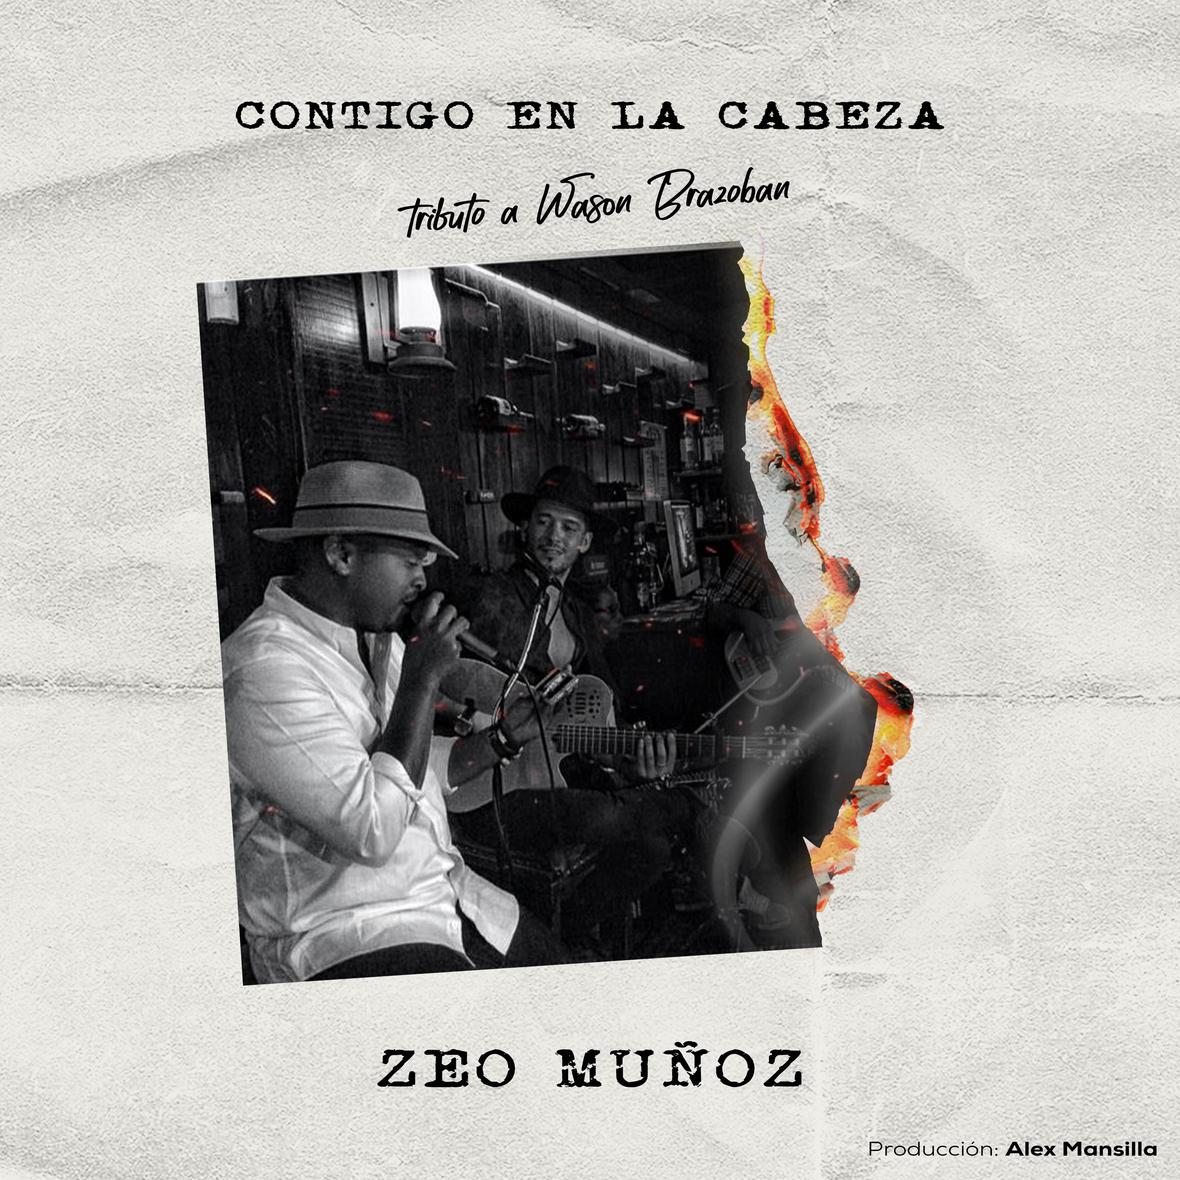 Zeo Munoz - Tributo a wason 1